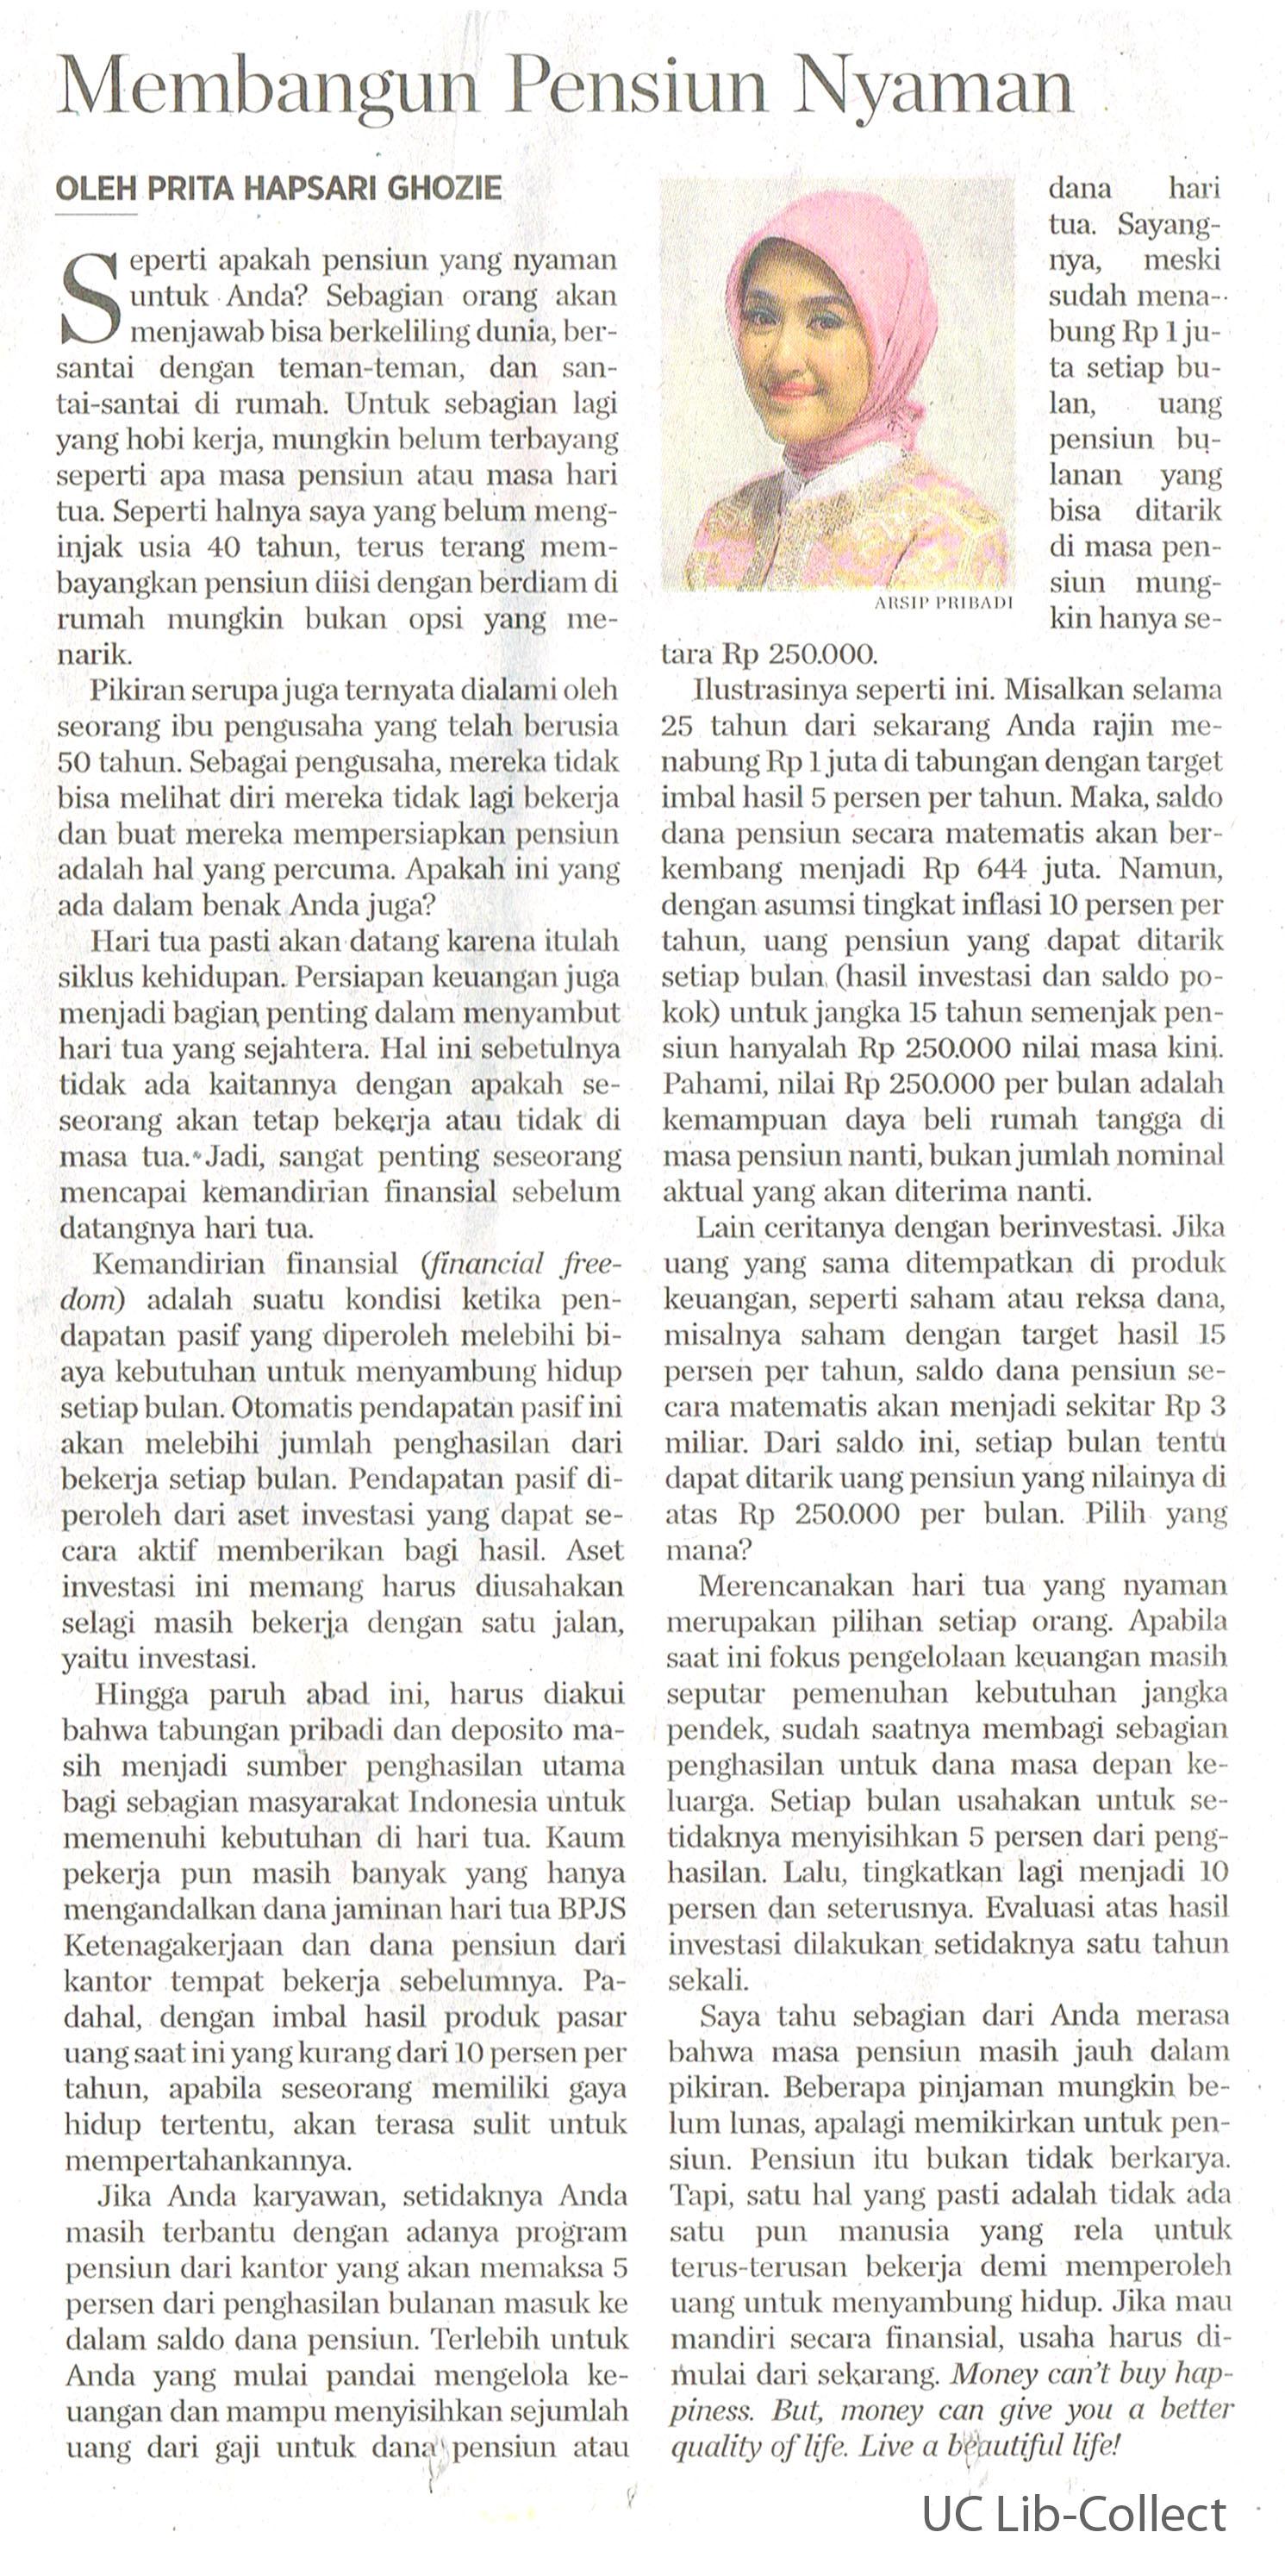 Membangun Pensiun Nyaman. Kompas. 23 Juli 2016. Hal.25